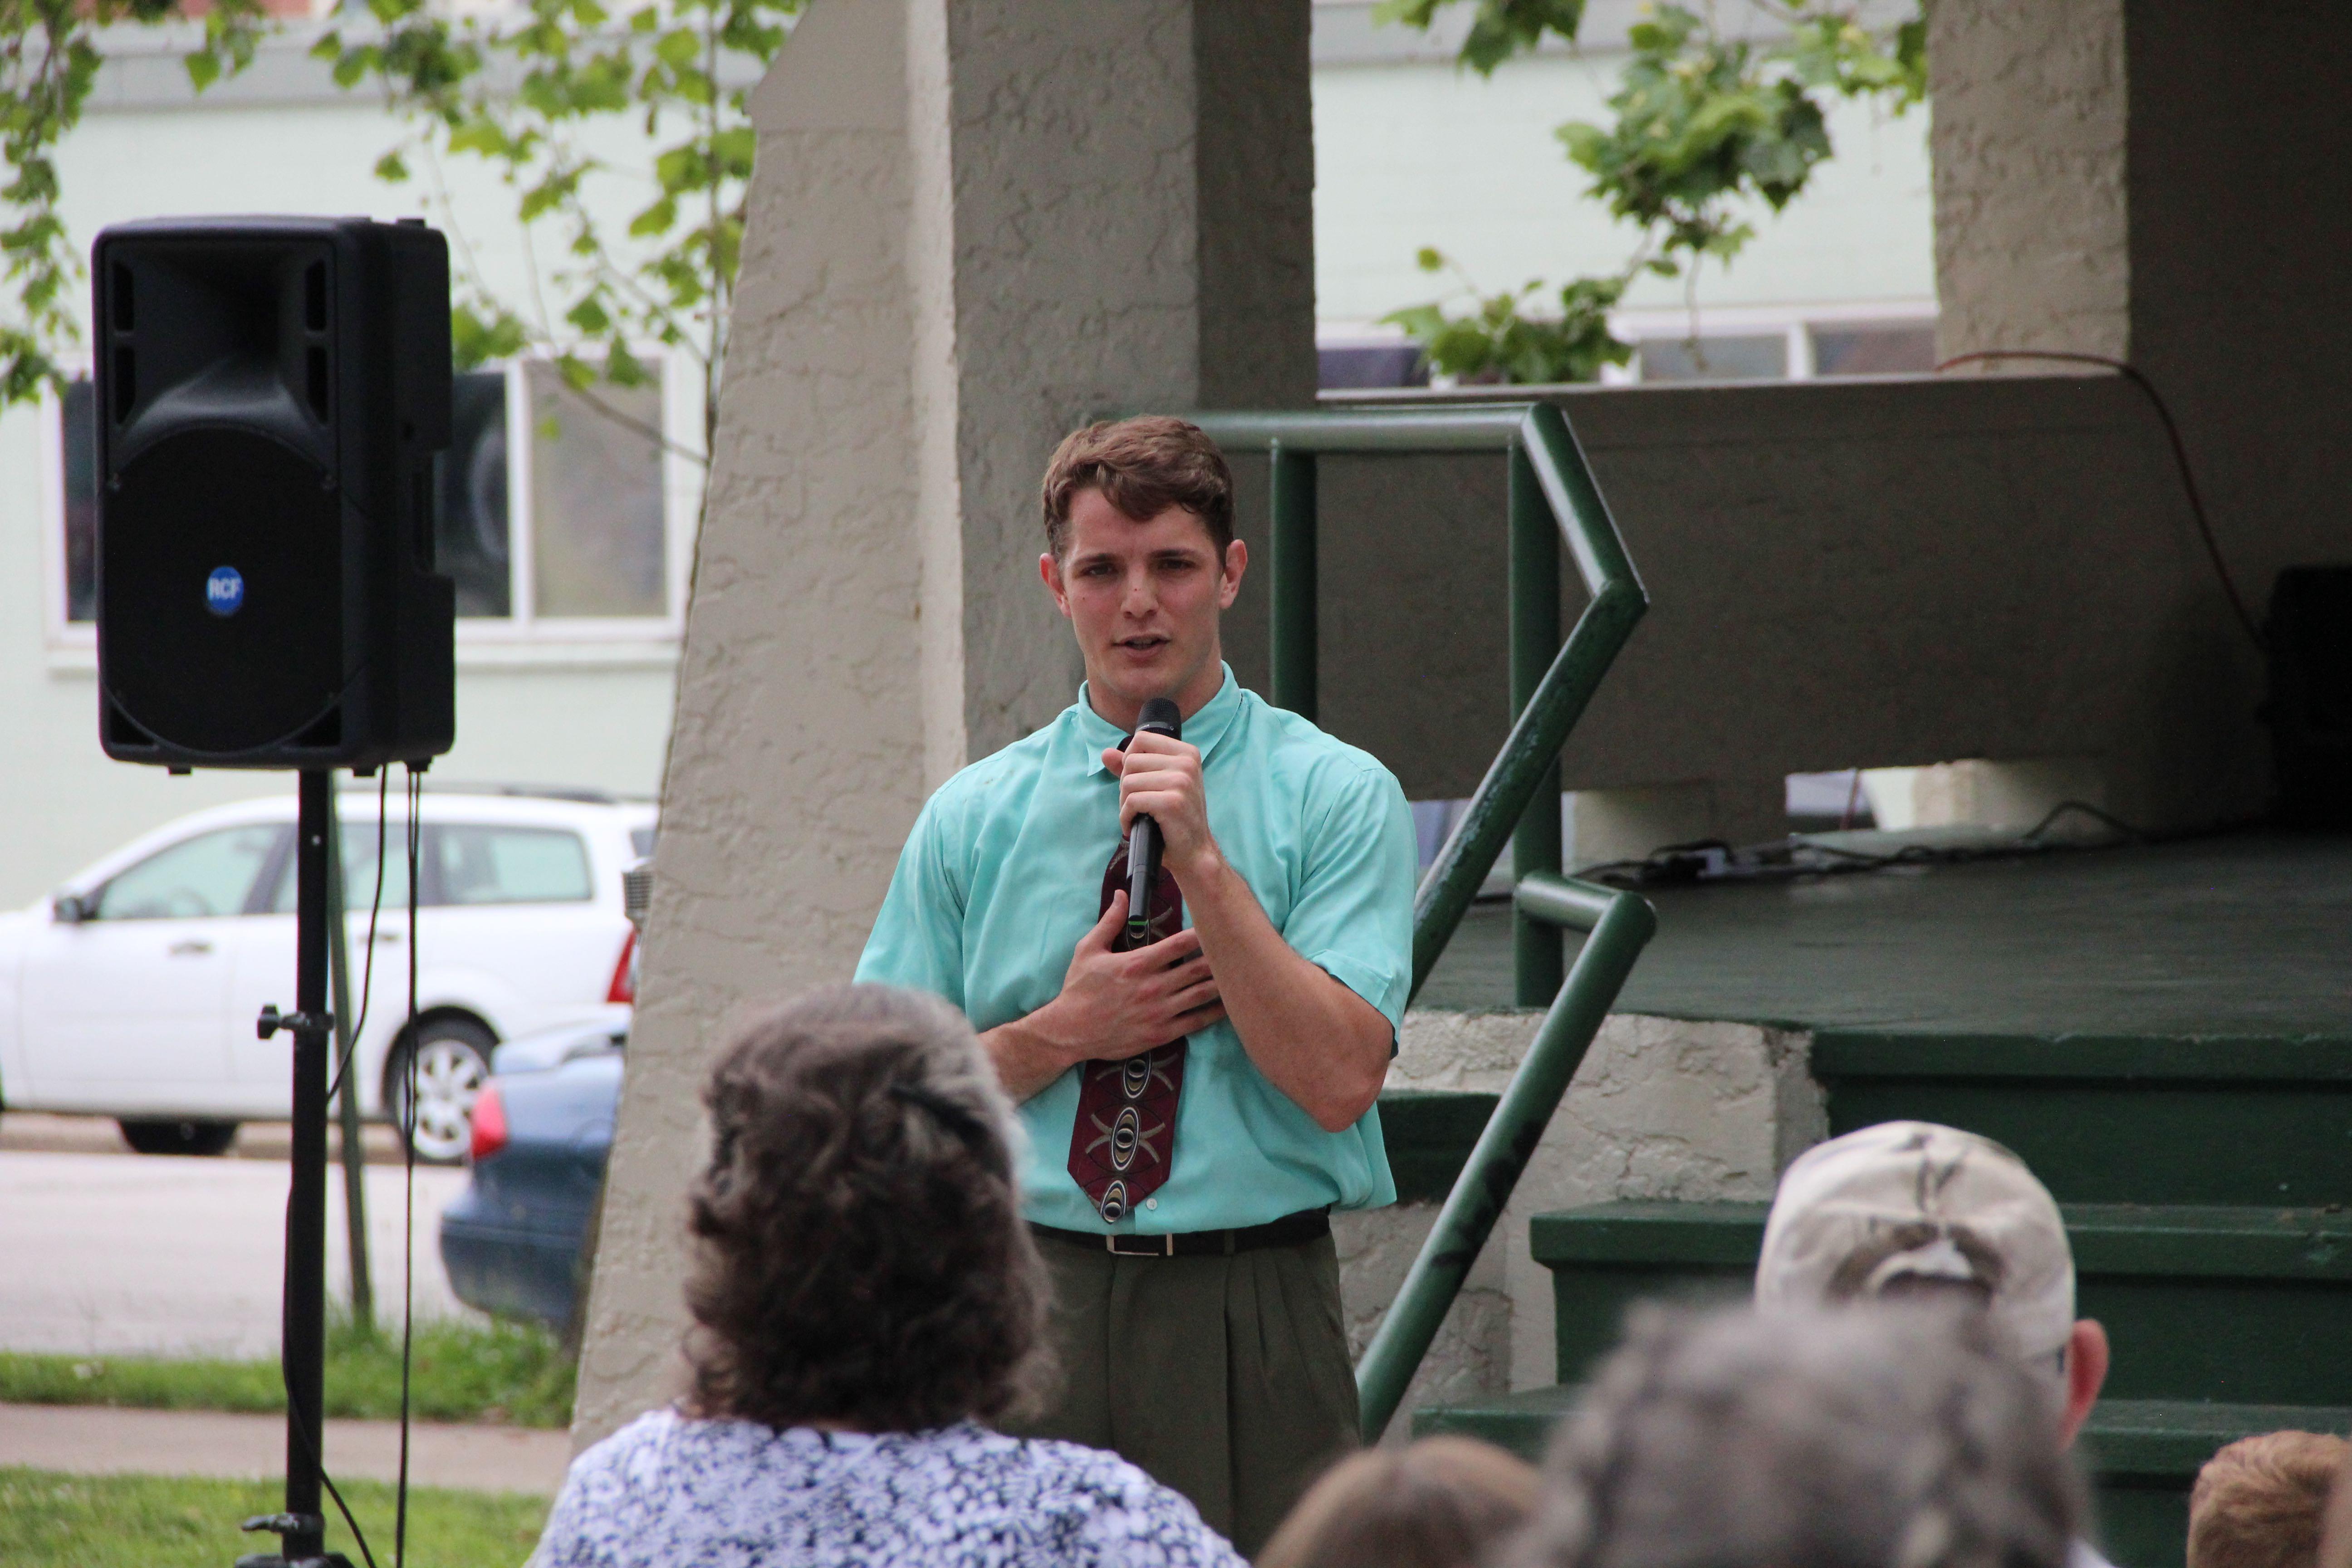 BYU performer in Hannibal, MO